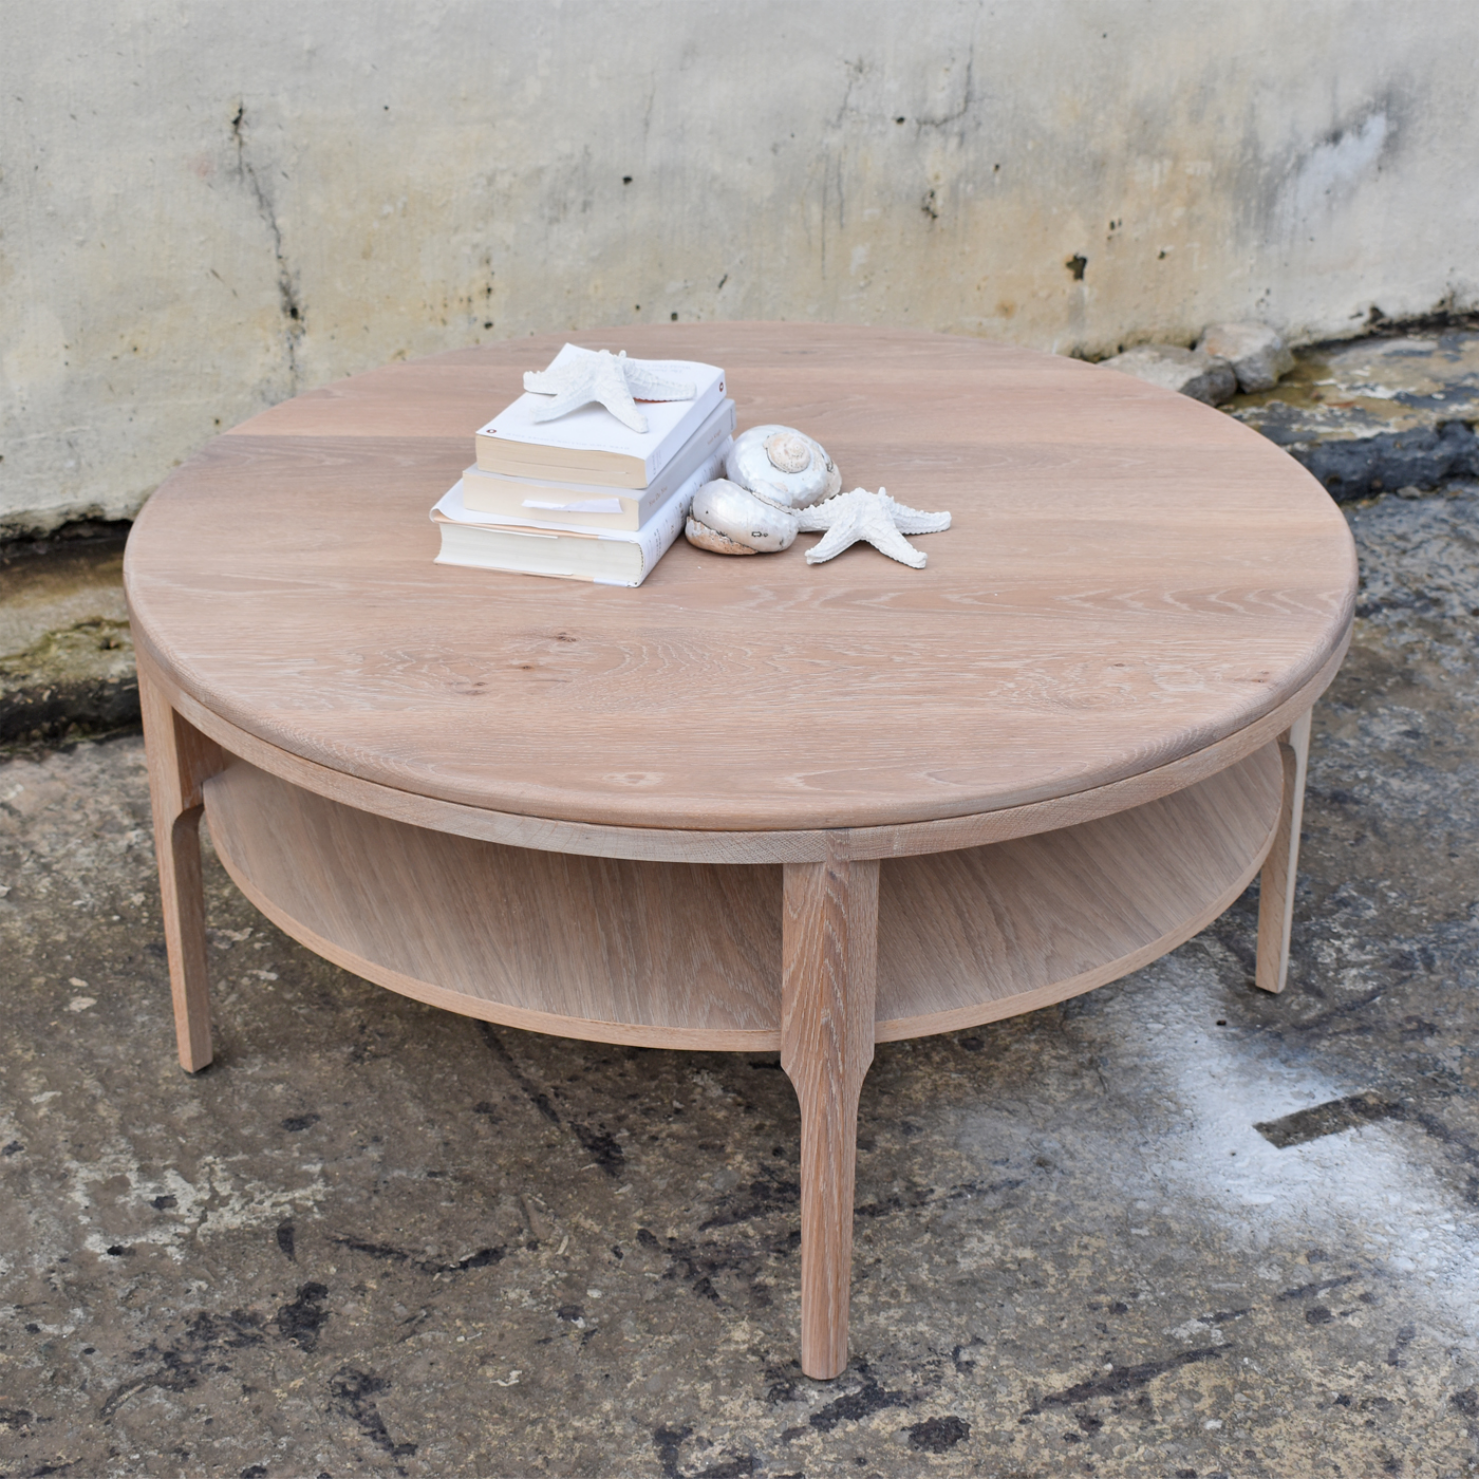 Outeniqua Round Coffee Table Iconomy Coffee Table Round Coffee Table Table [ 1479 x 1479 Pixel ]